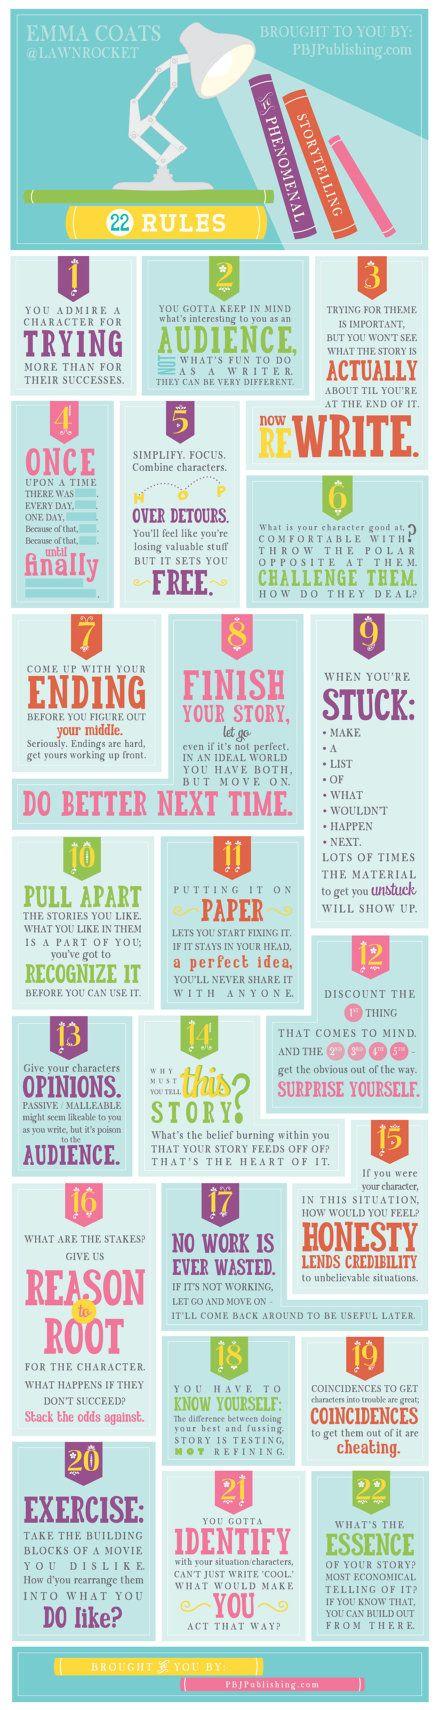 Poster  22 Rules to Phenomenal Storytelling by PBJpublishing, $20.99